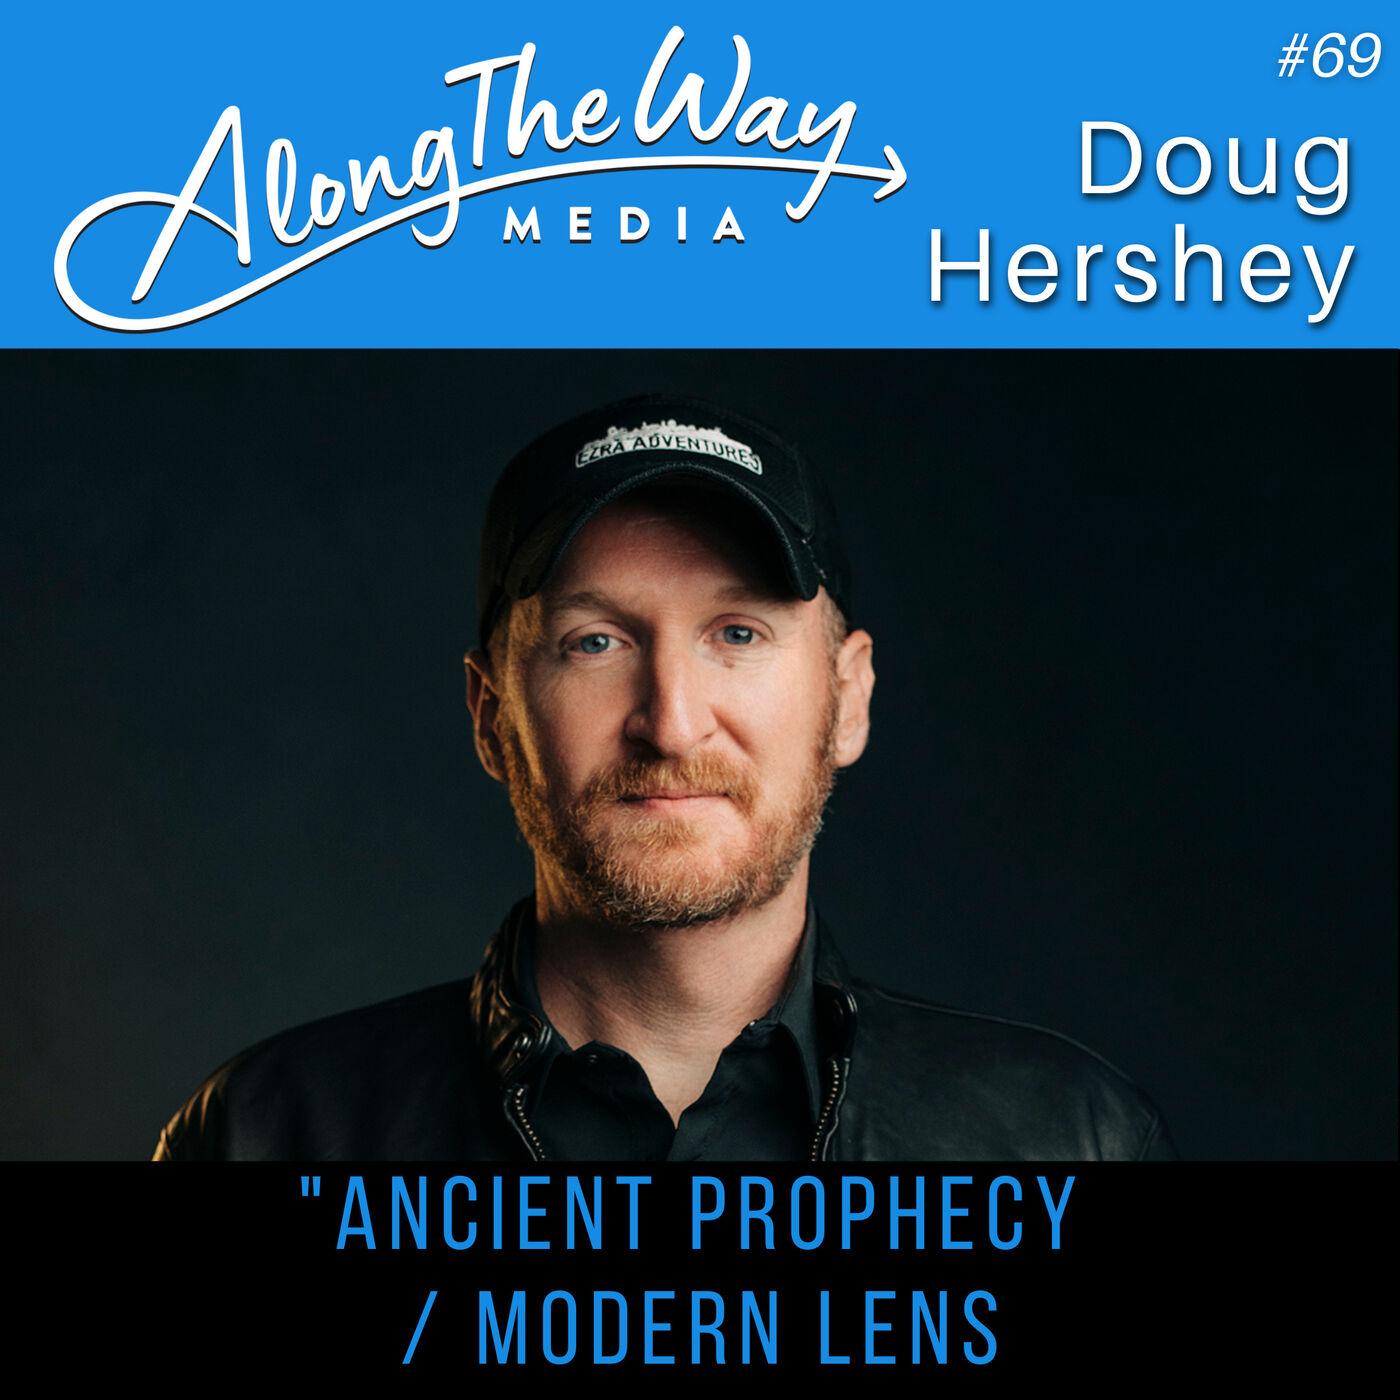 """Ancient Prophecy Through a Modern Lens"" - Doug Hershey AlongTheWay 69"